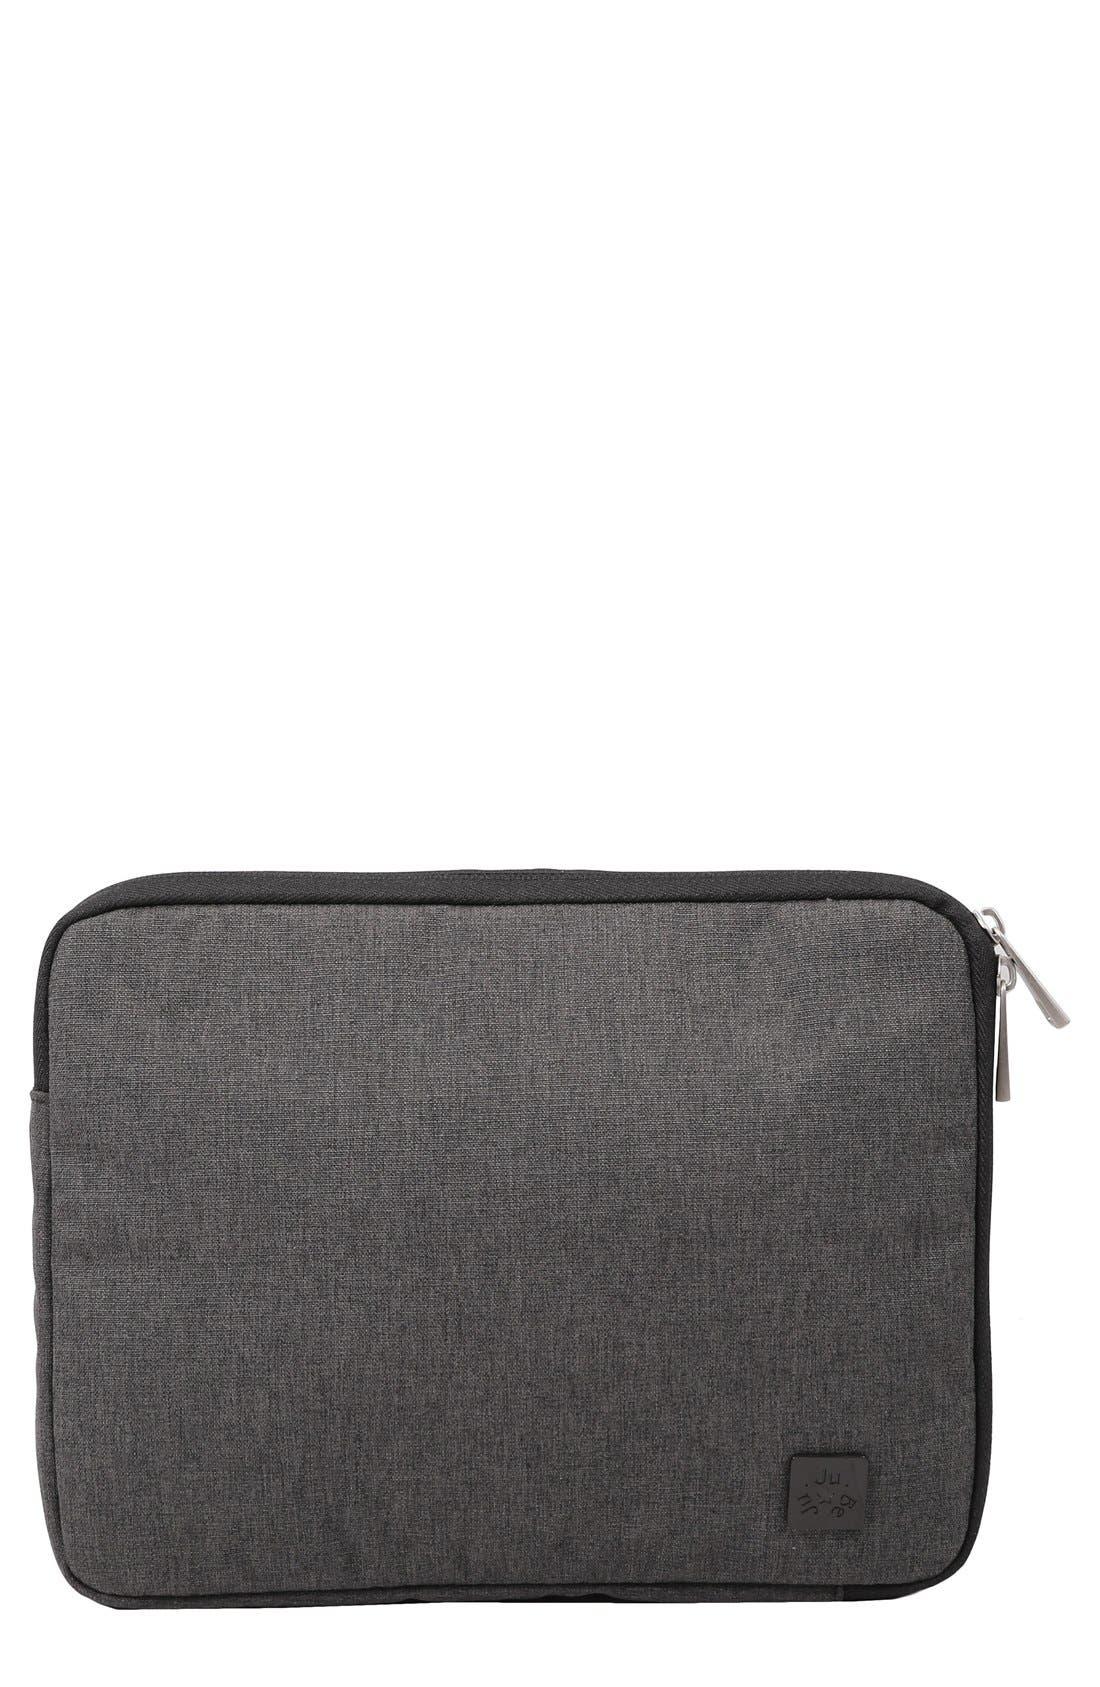 Micro Tech Tablet Case,                         Main,                         color, Chrome